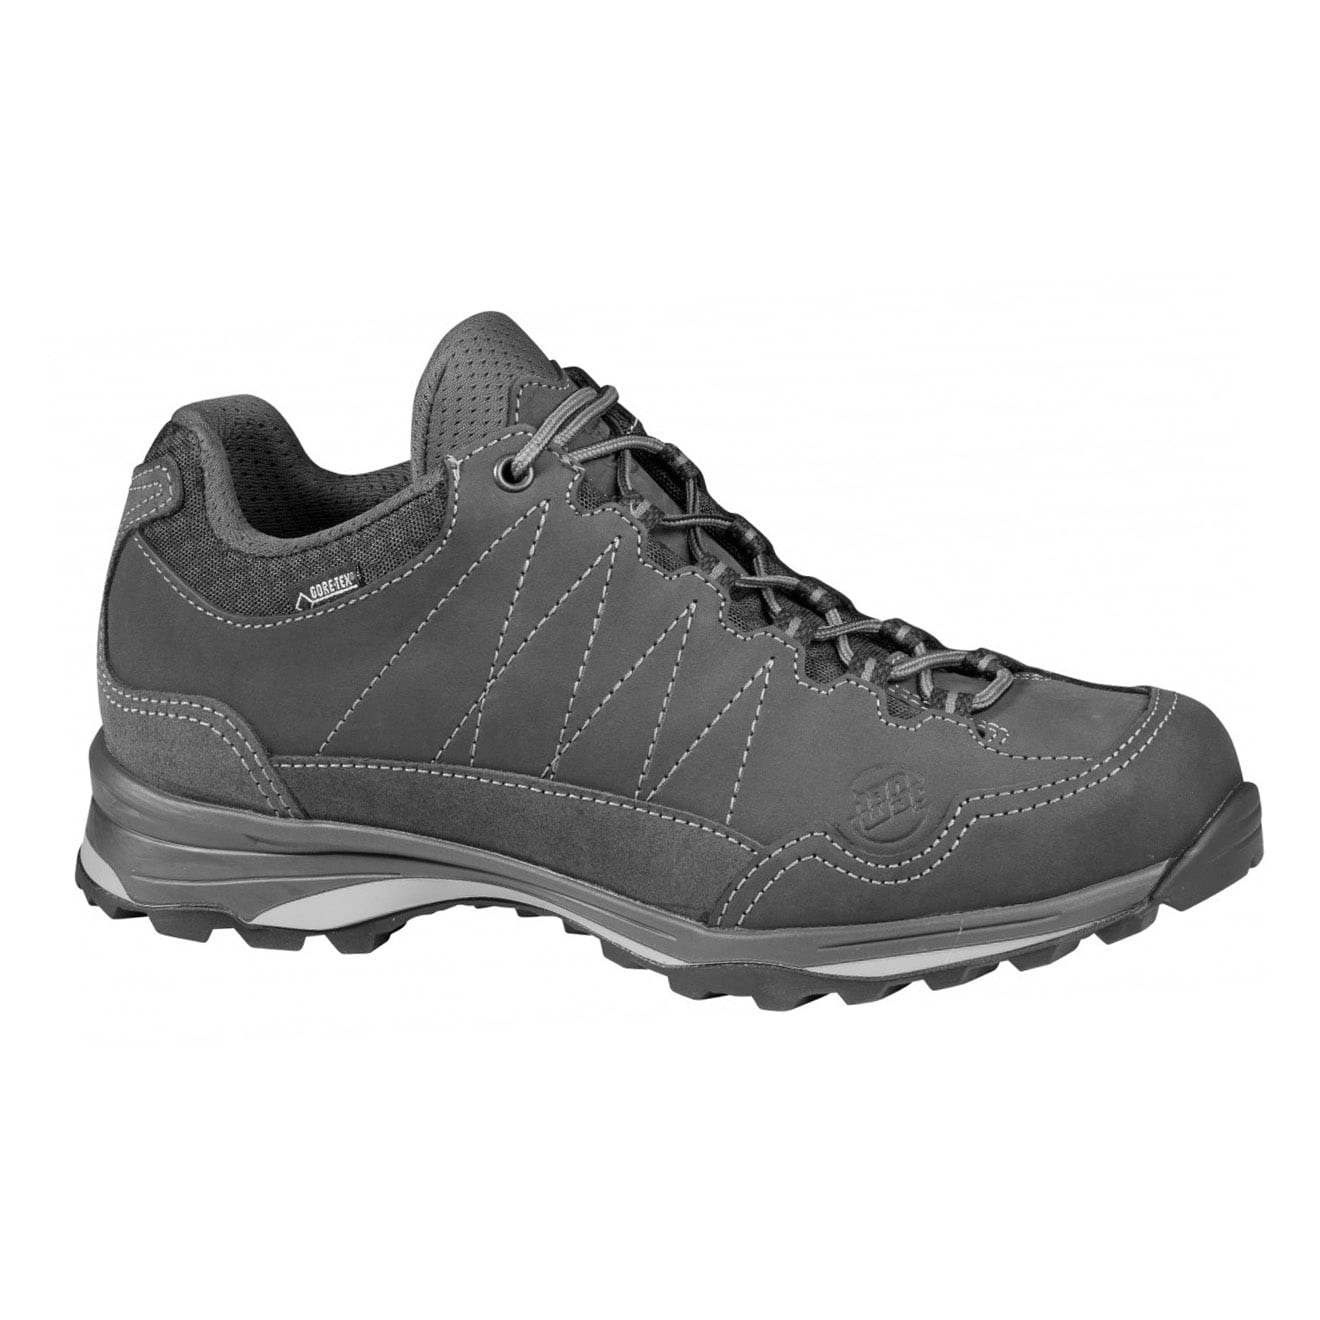 Hanwag robin light GTX boots asphalt black